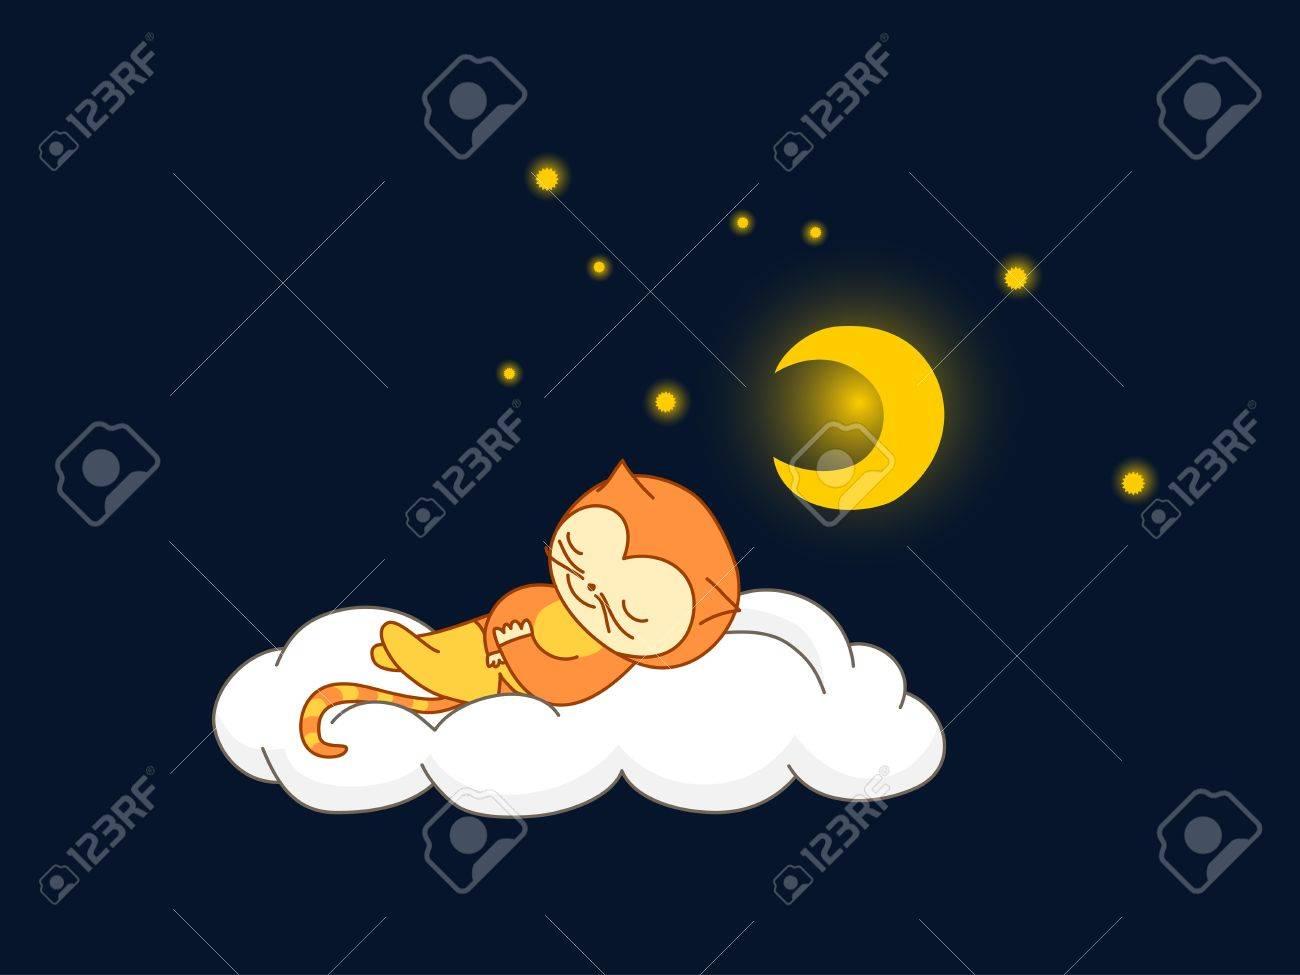 Cute kid in cat costume sleeping on a cloud Stock Vector - 11493627